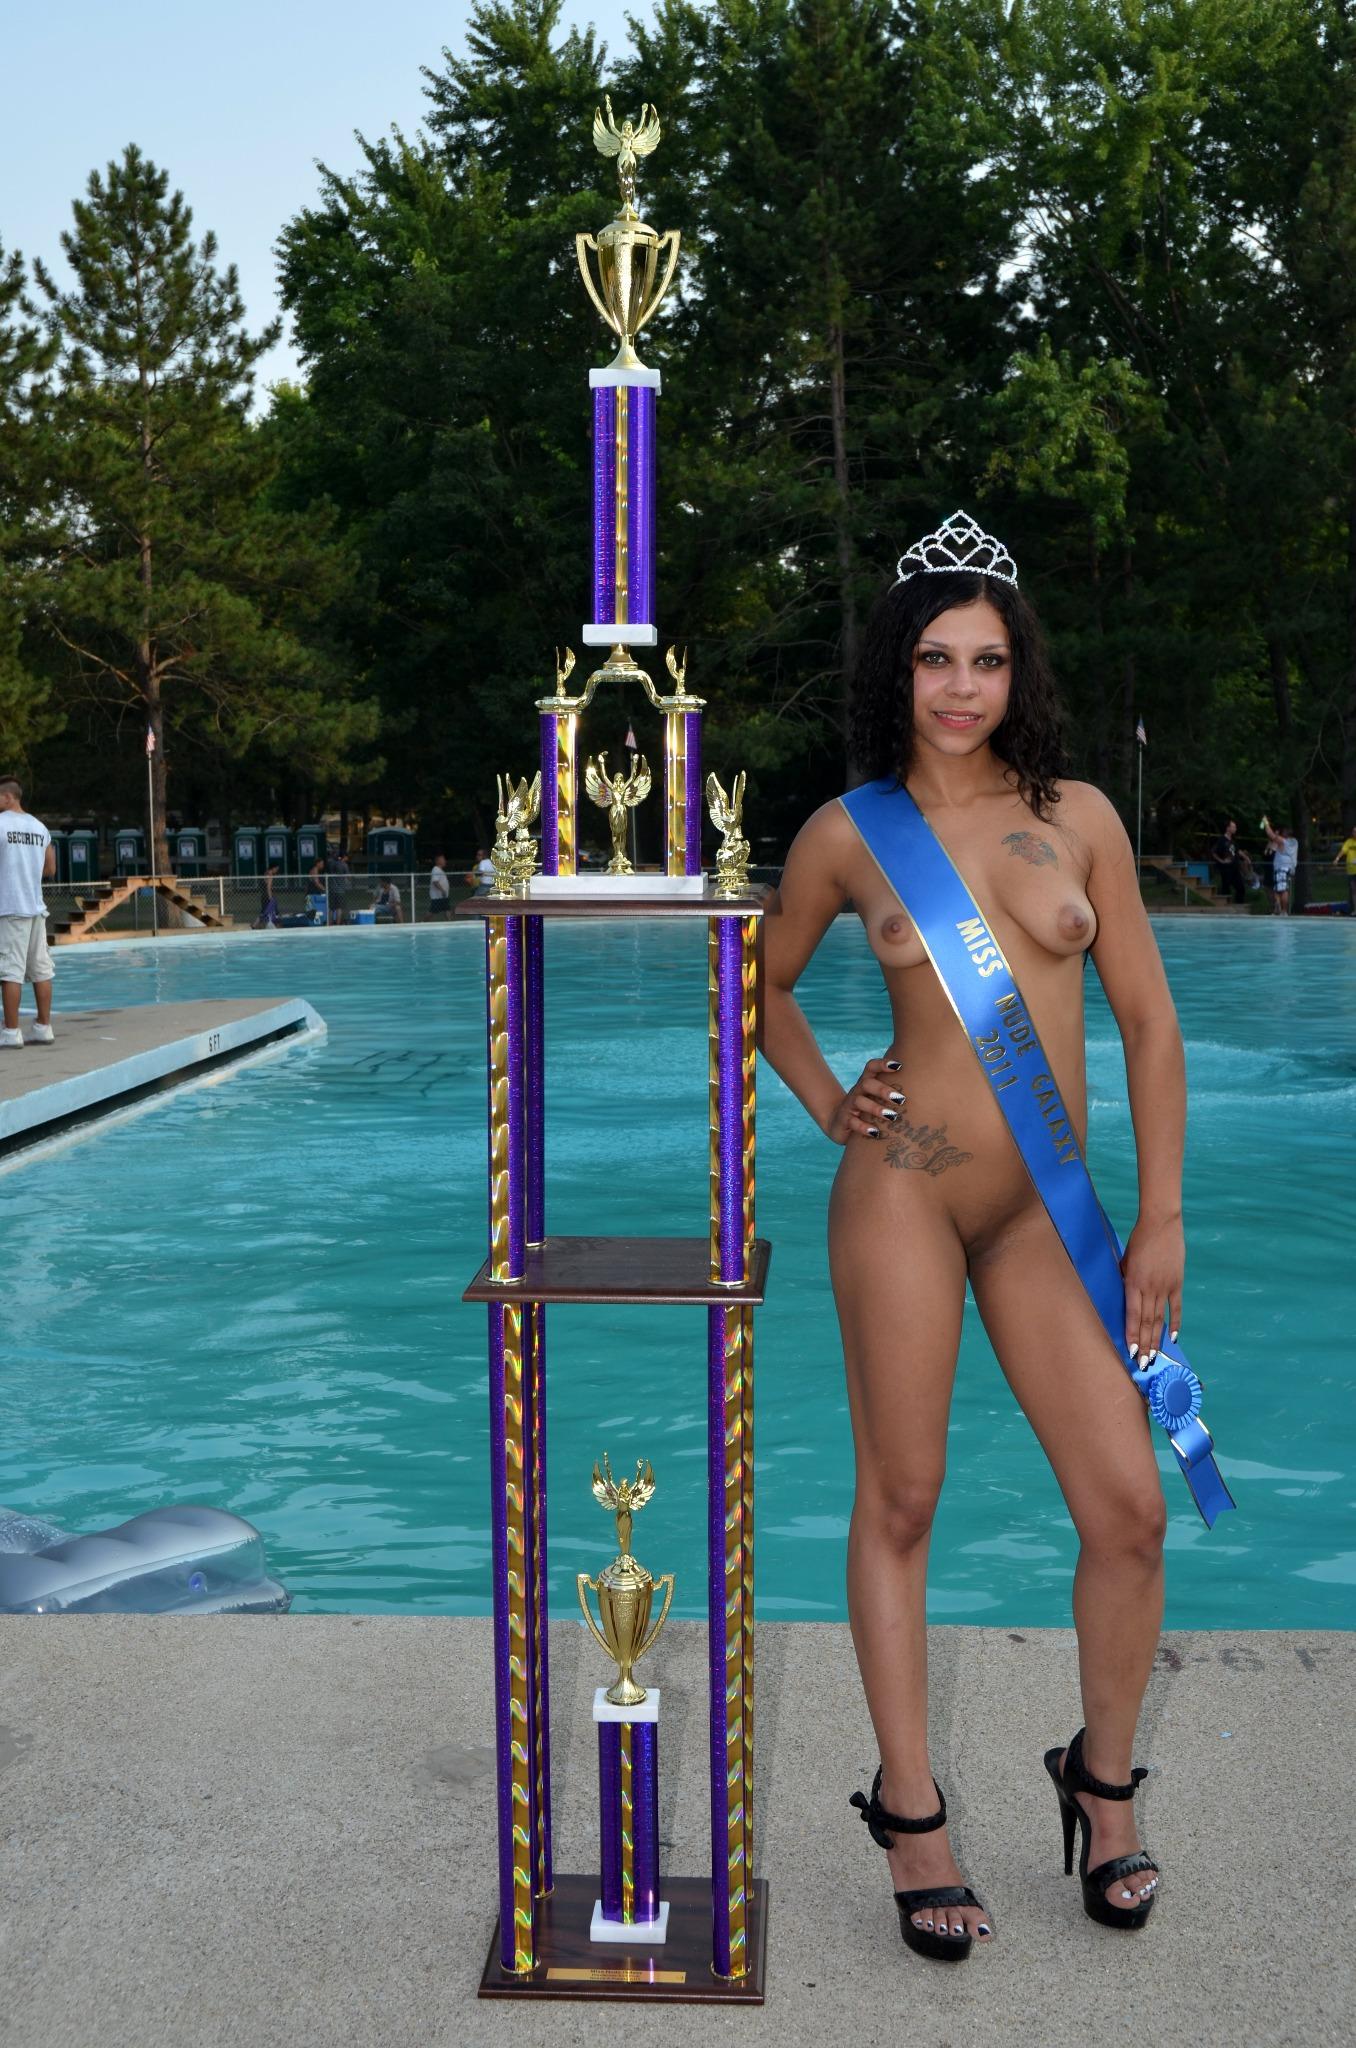 Miss galaxy nude contest jailbait